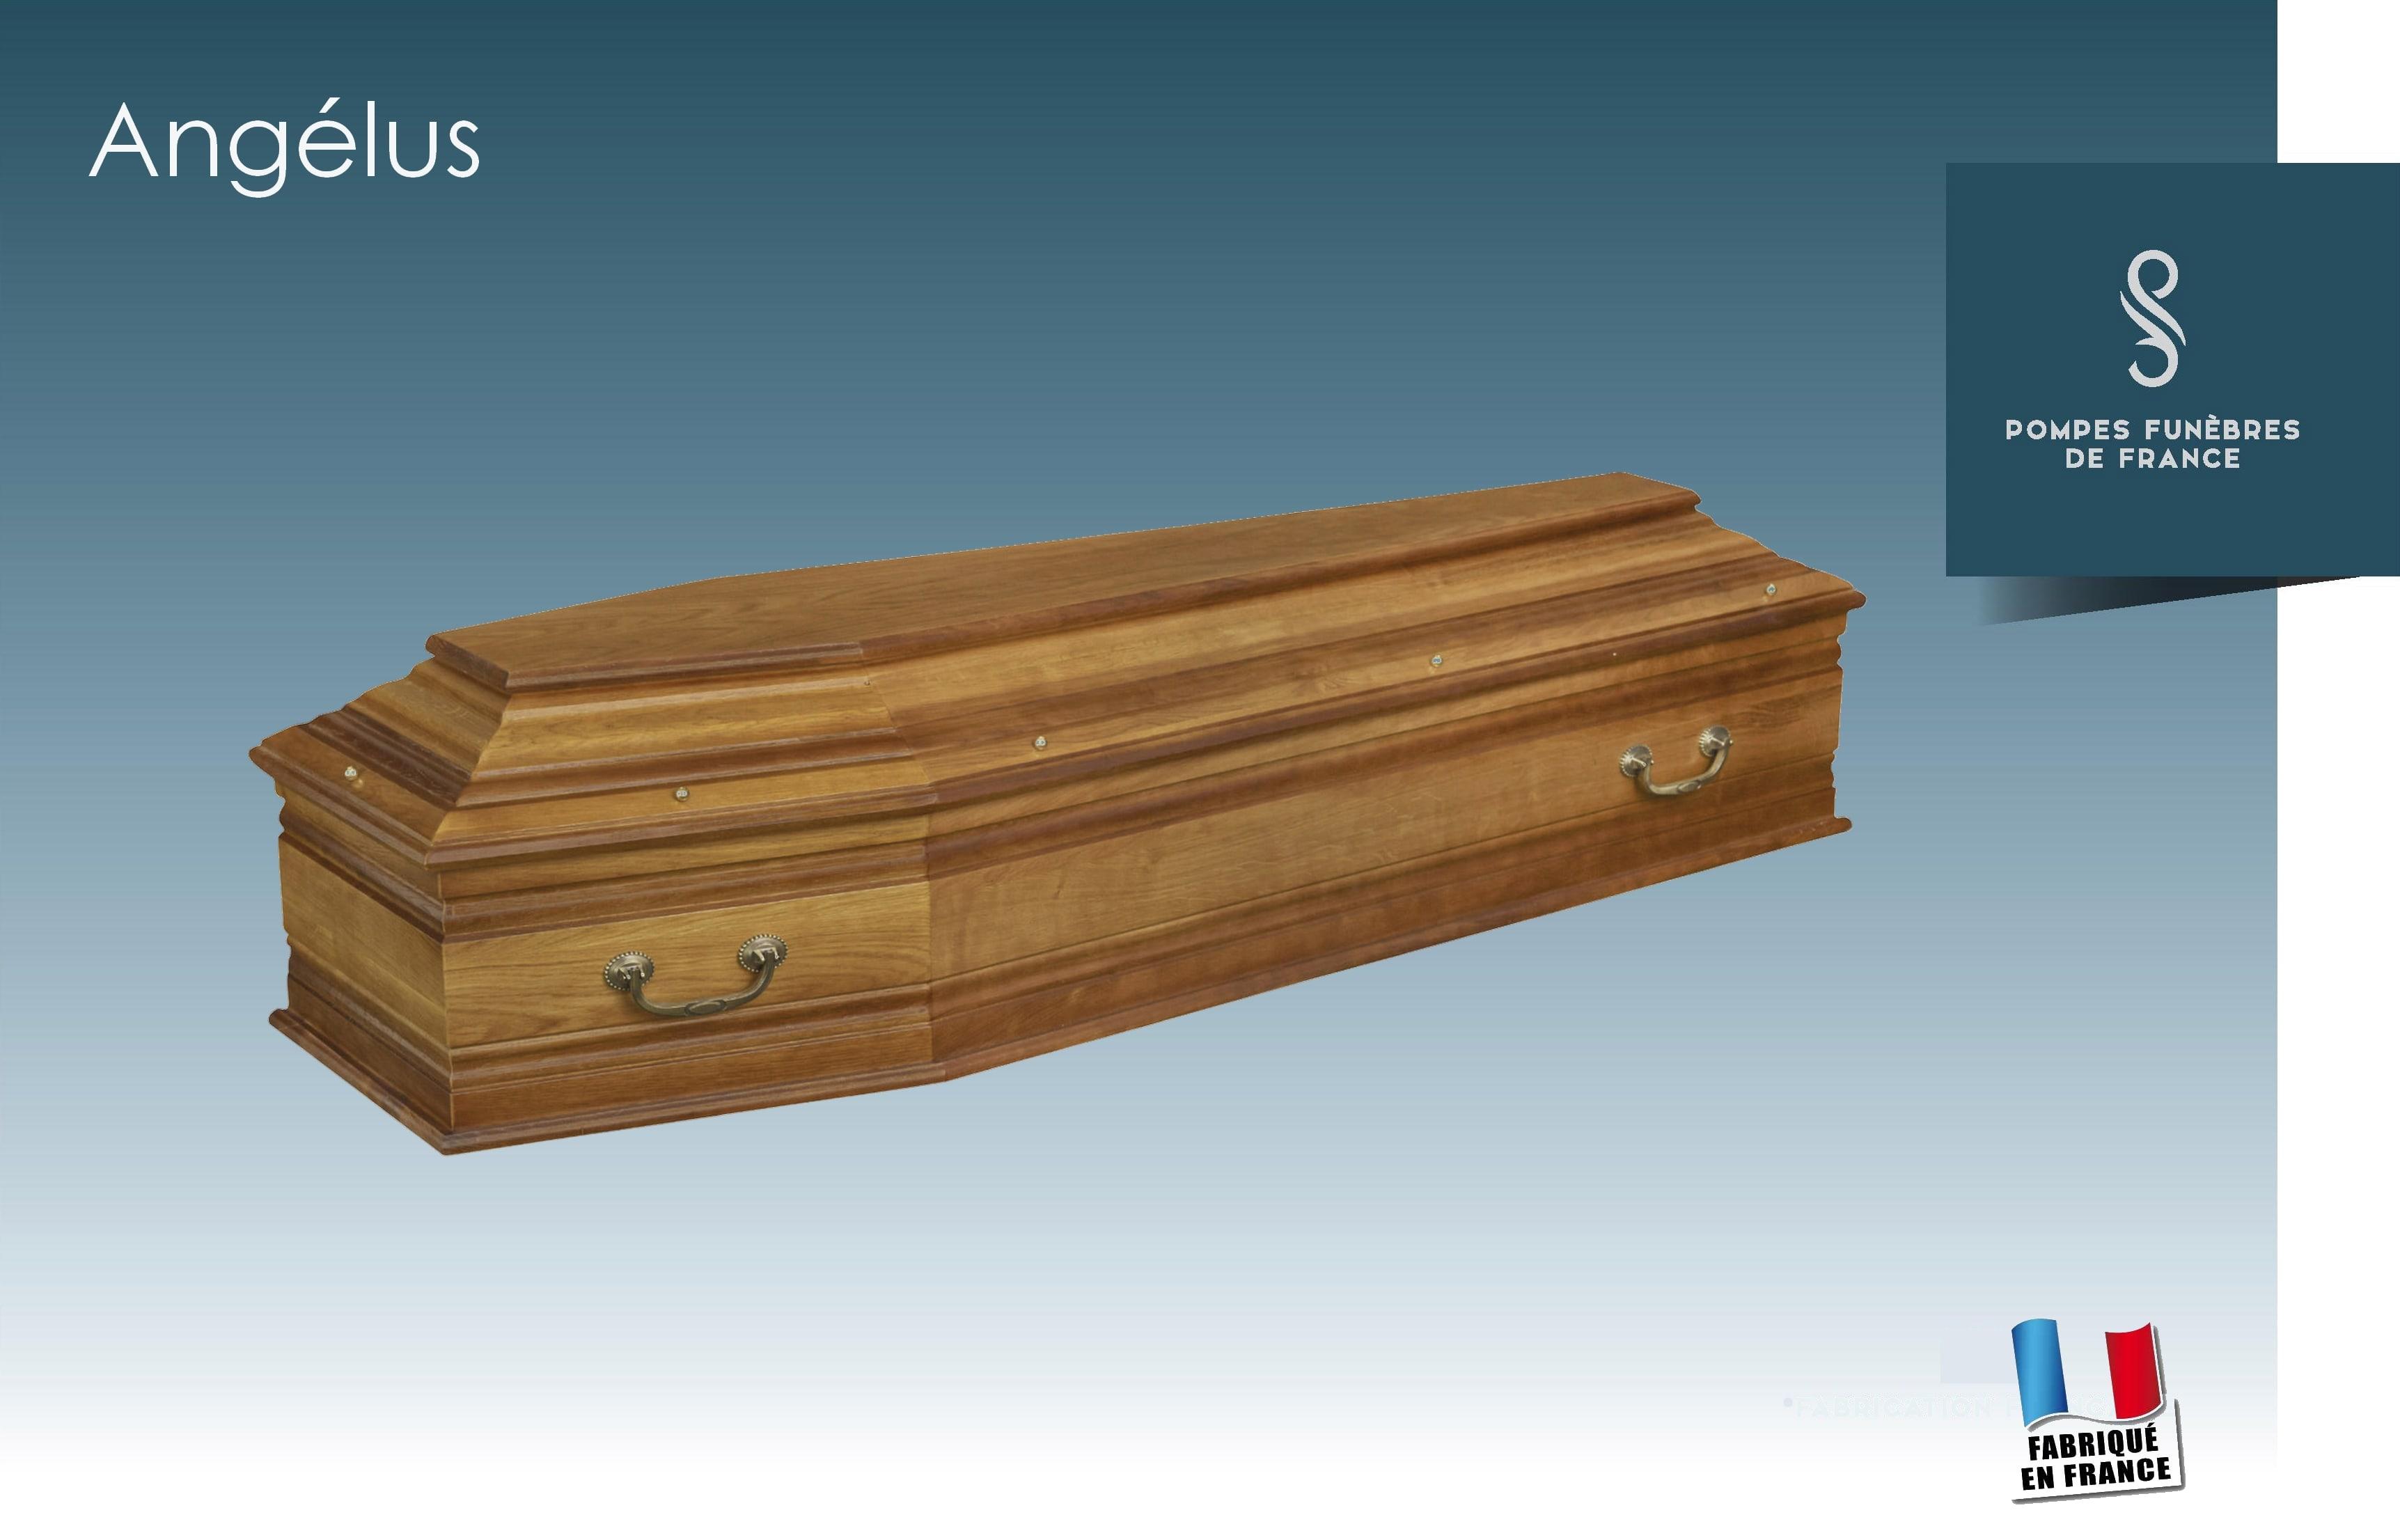 Cercueil Angélus